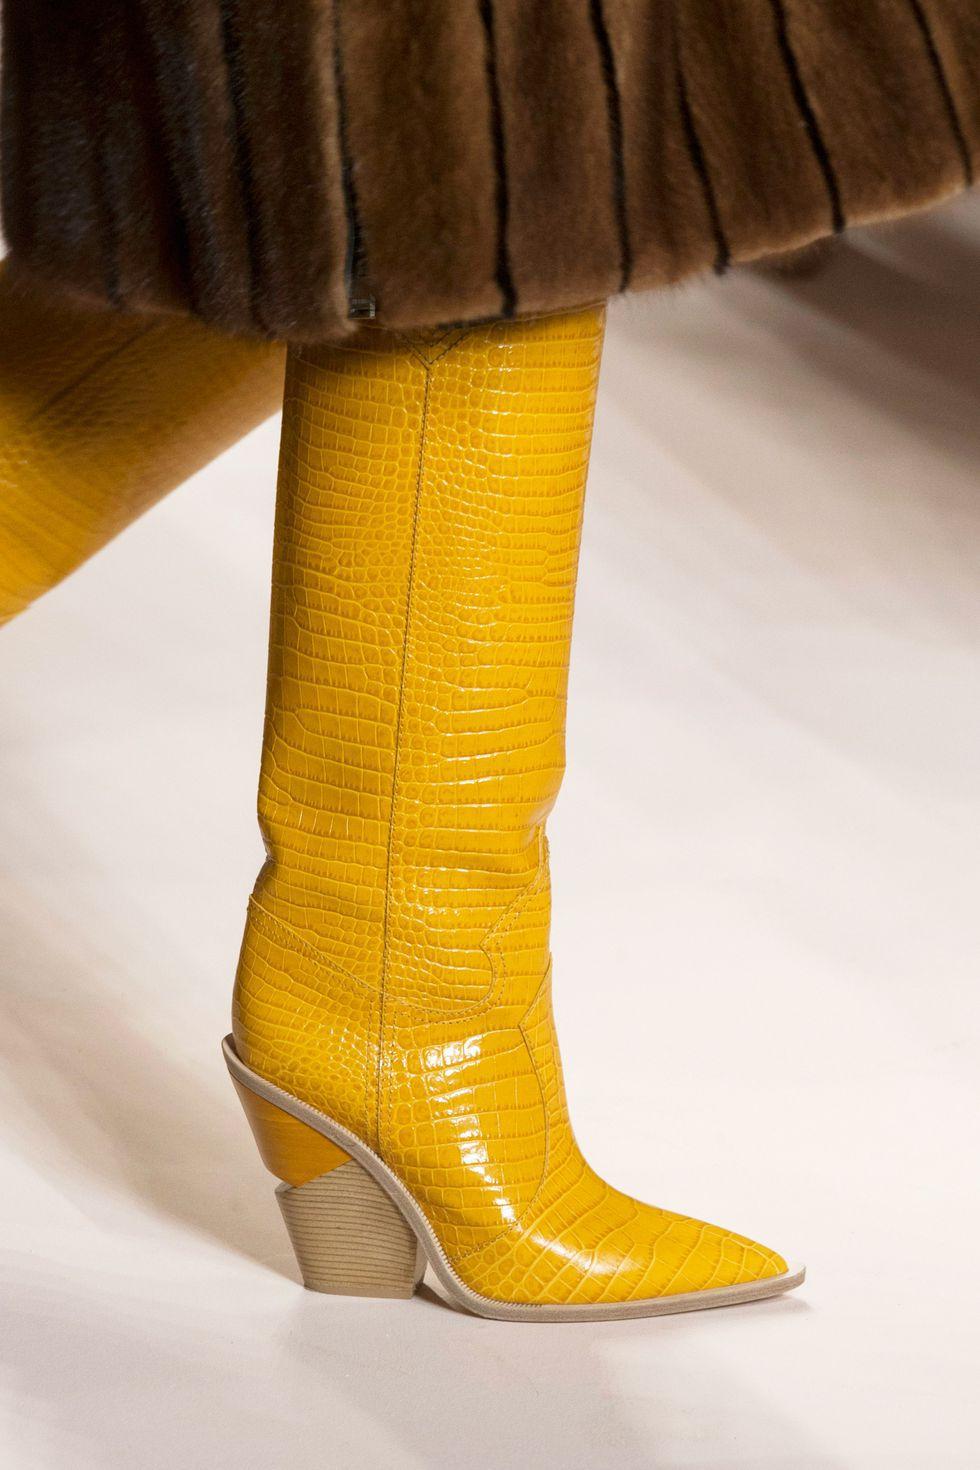 fendi-catwalk-cowboy-boots-1519661796.jpg